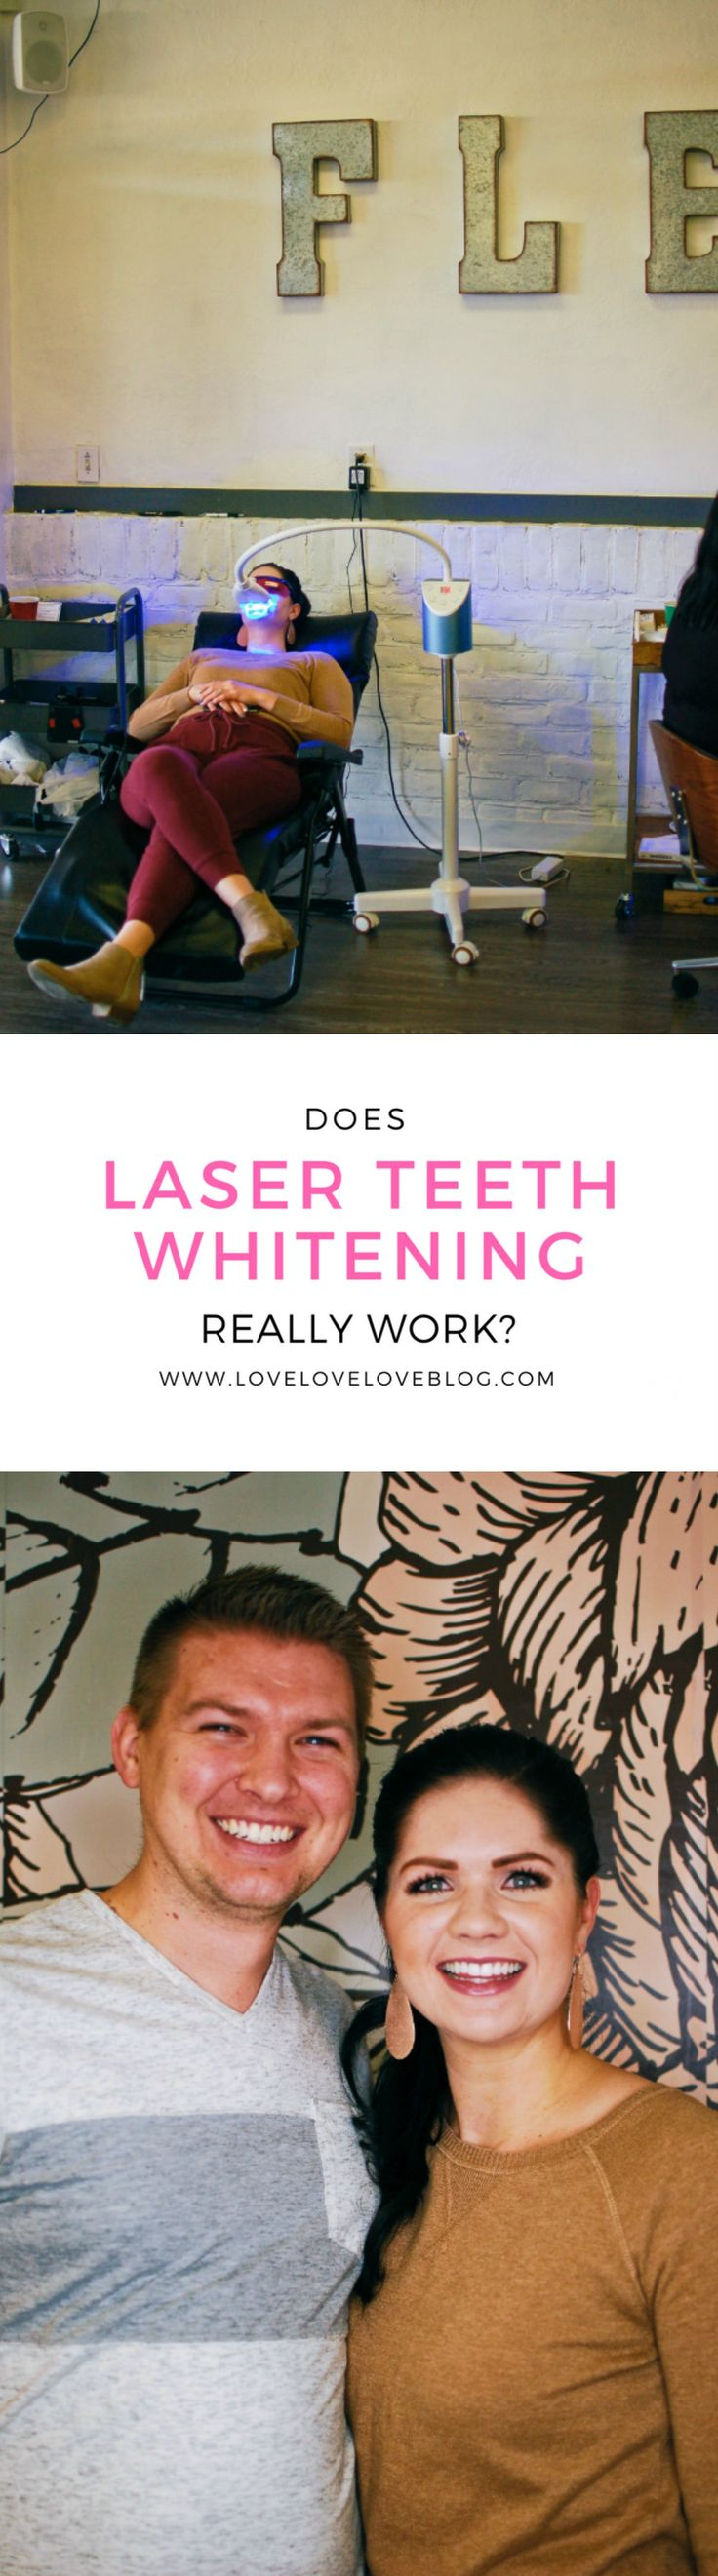 Teeth whitening | laser teeth whitening | beauty